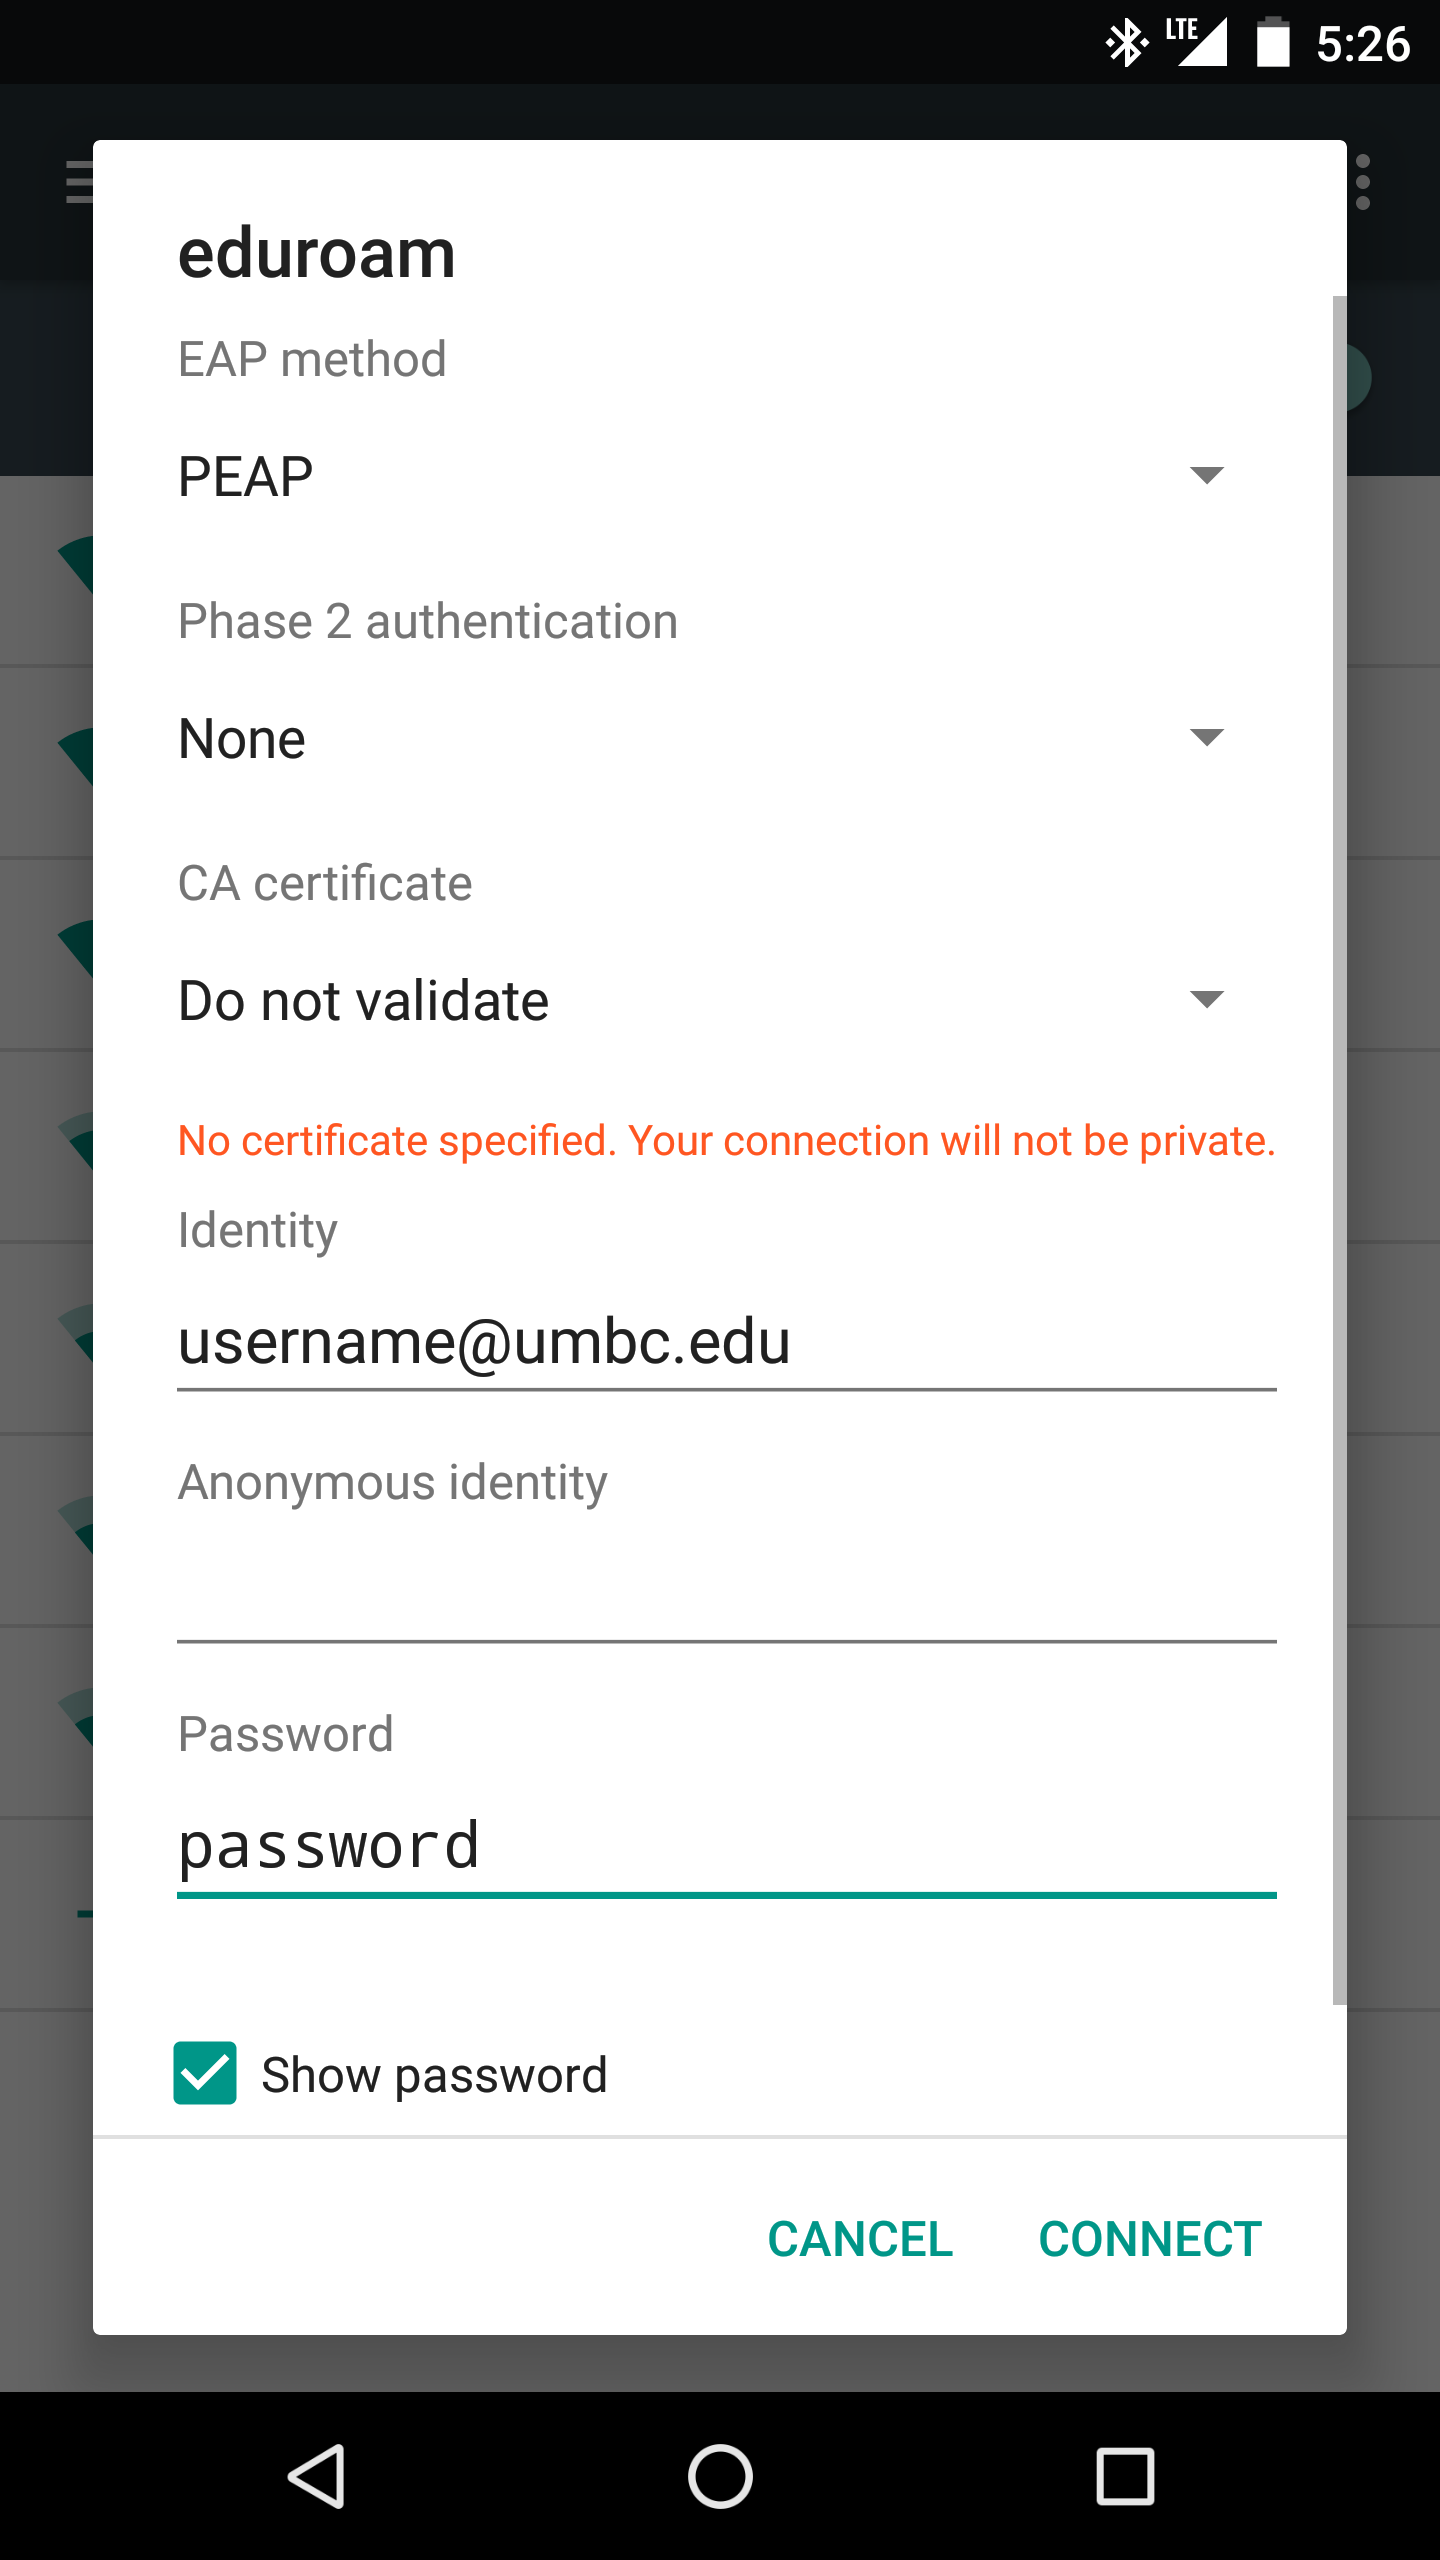 How do I setup my Android device to connect to UMBC eduroam wireless ...